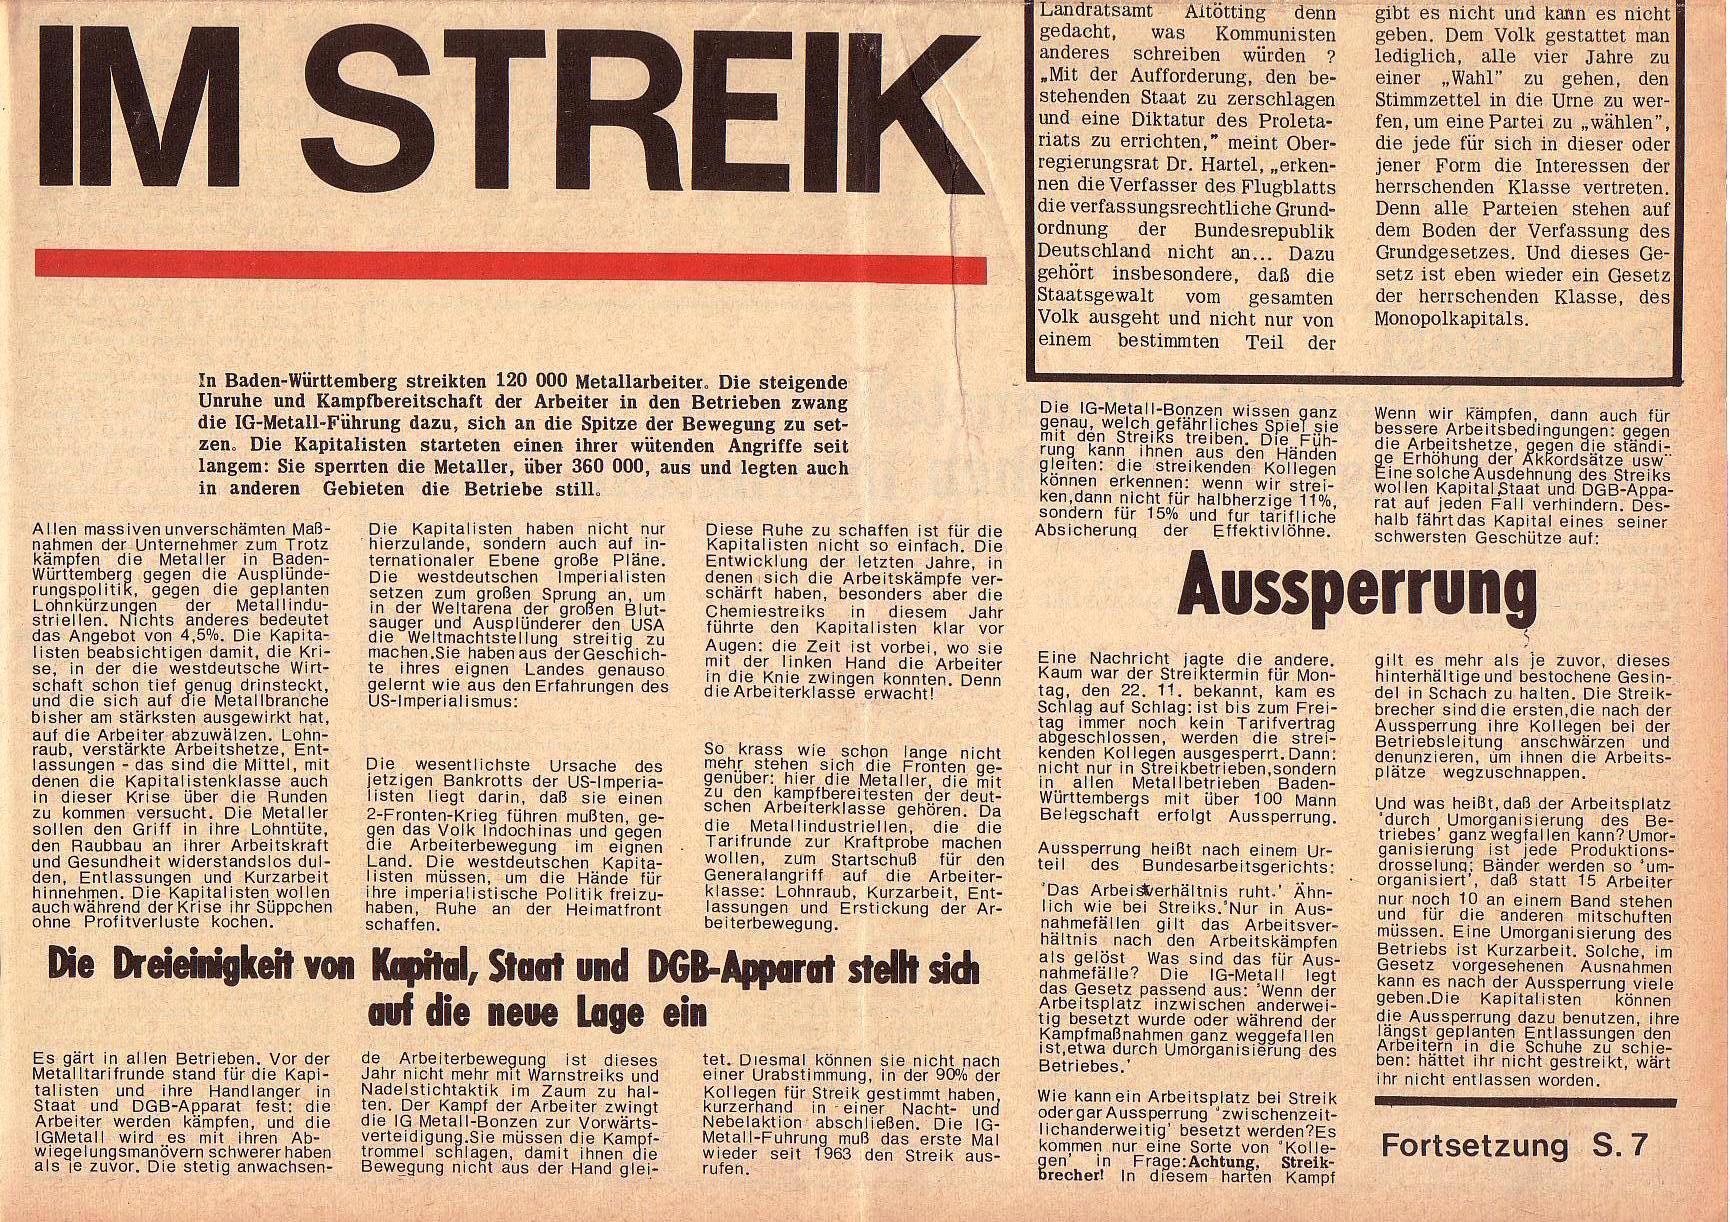 Roter Morgen, 5. Jg., 6. Dezember 1971, Nr. 15, Seite 1b